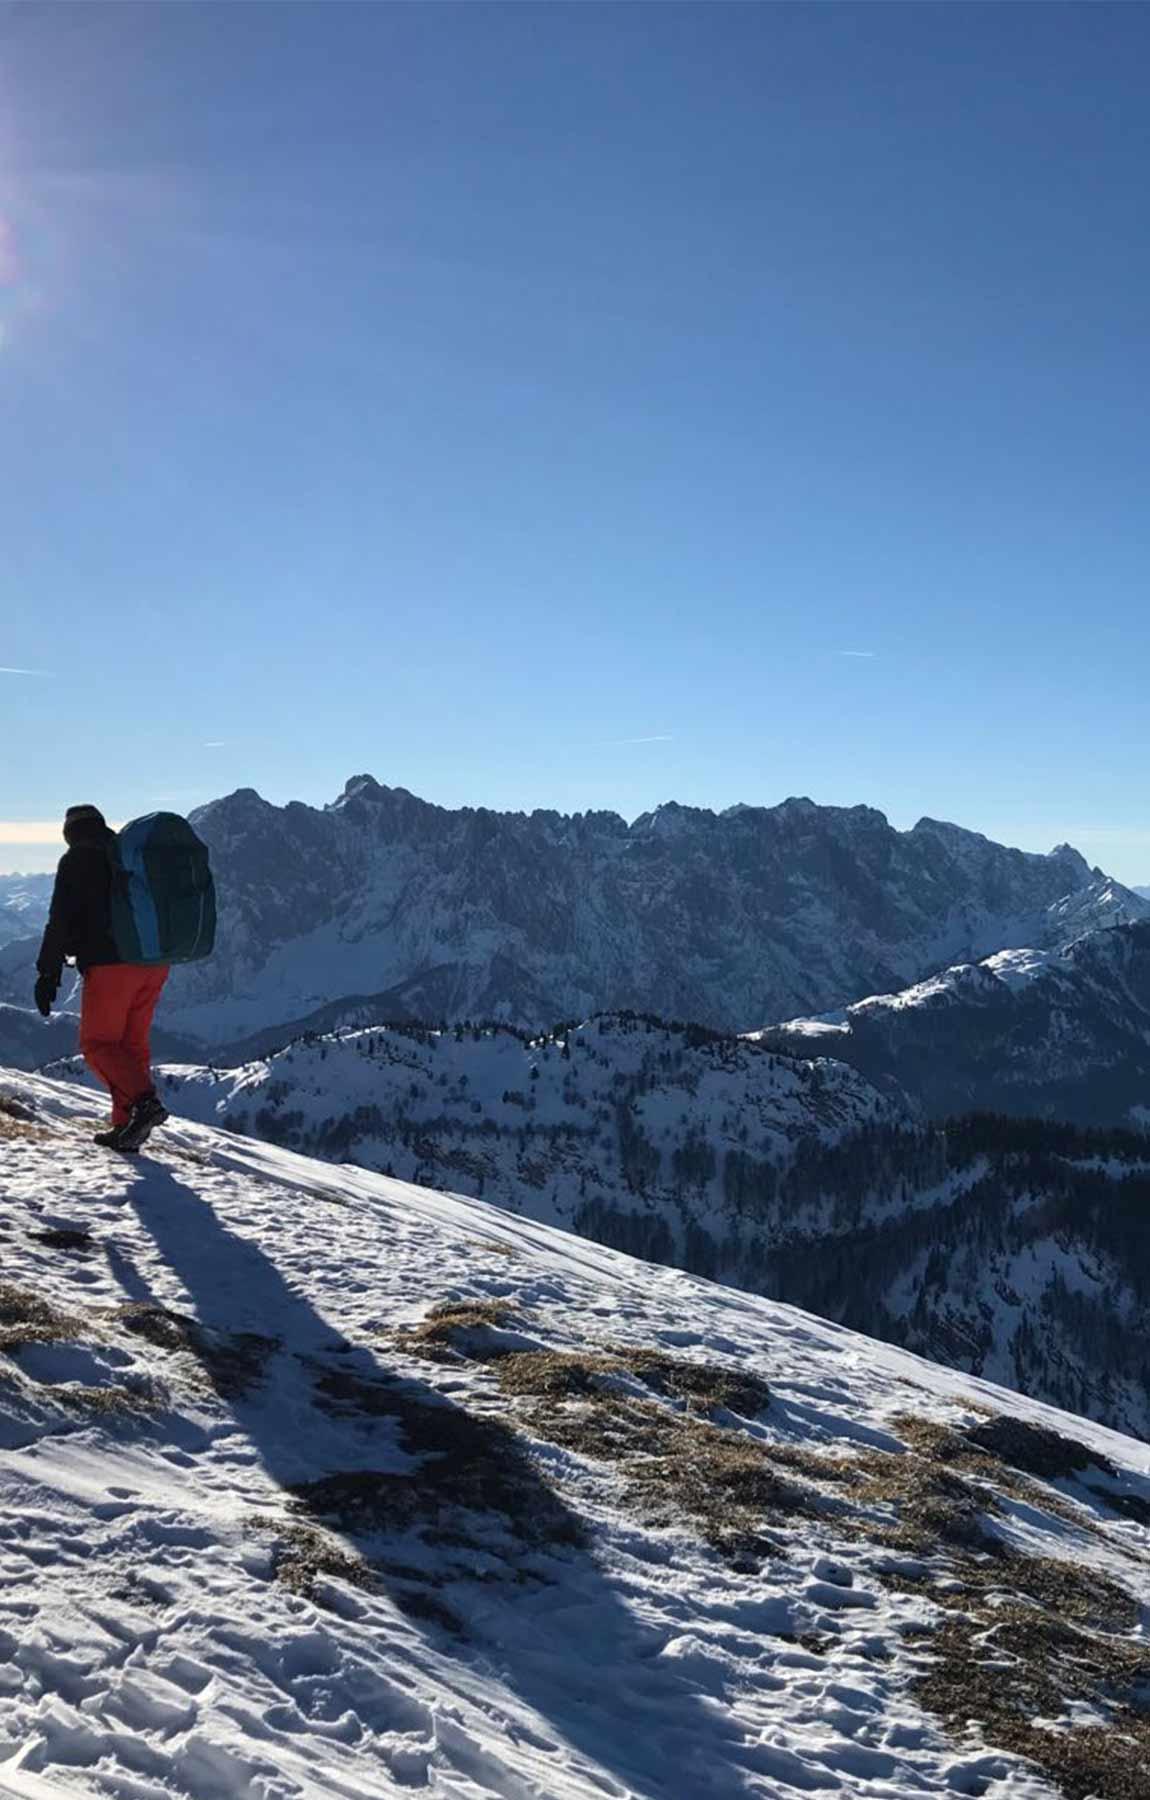 bergwanderführer tirol - wanderung im winter